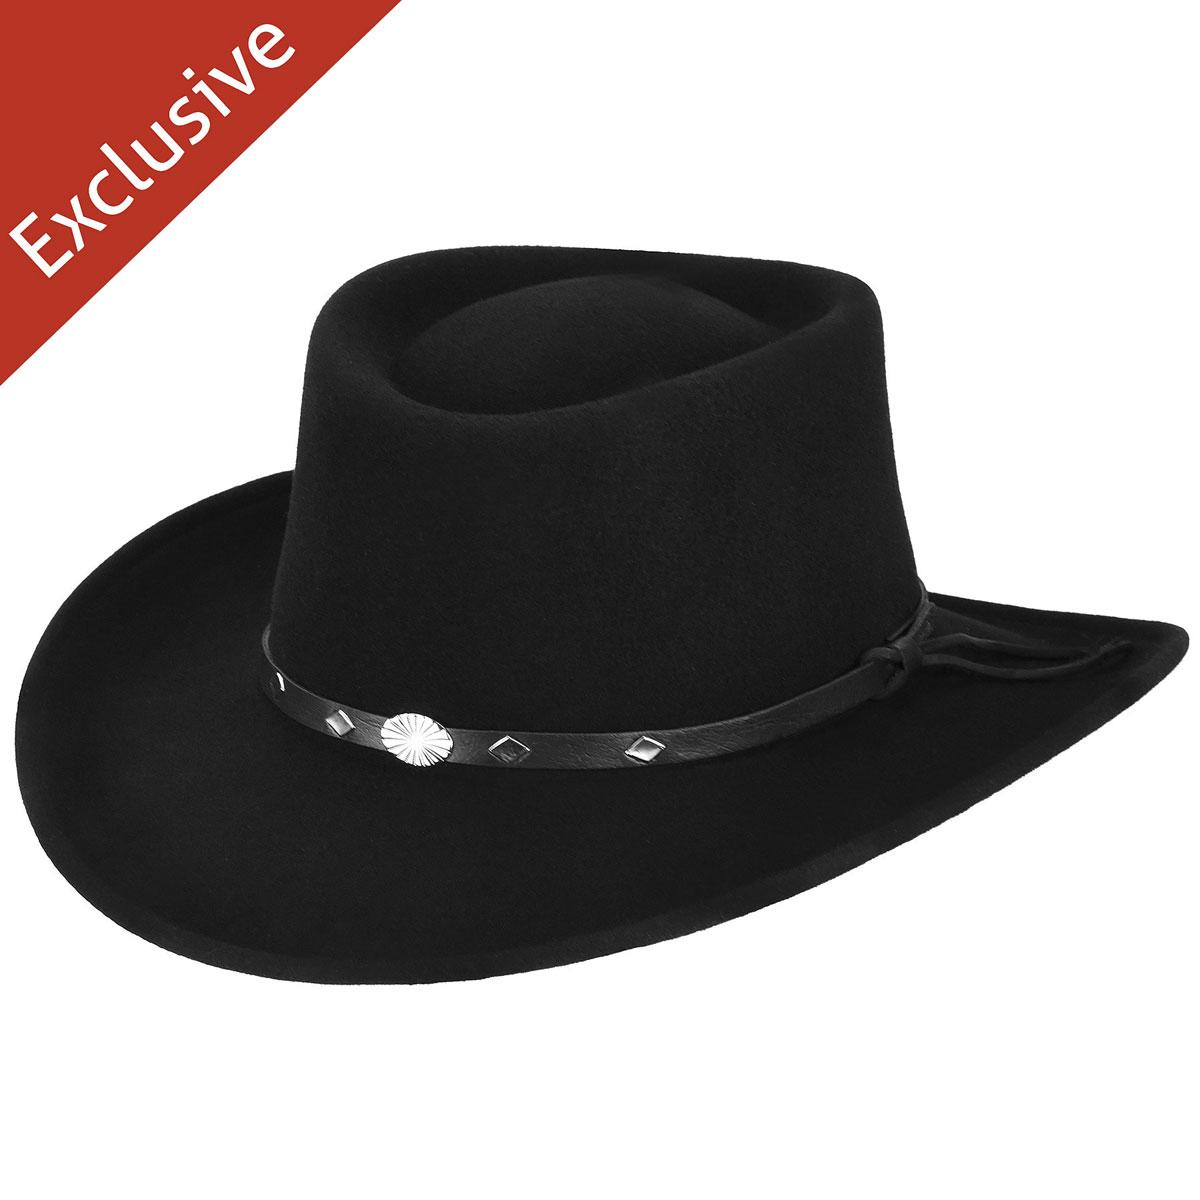 Hats.com Ace of Spades Gambler Hat - Exclusive in Black